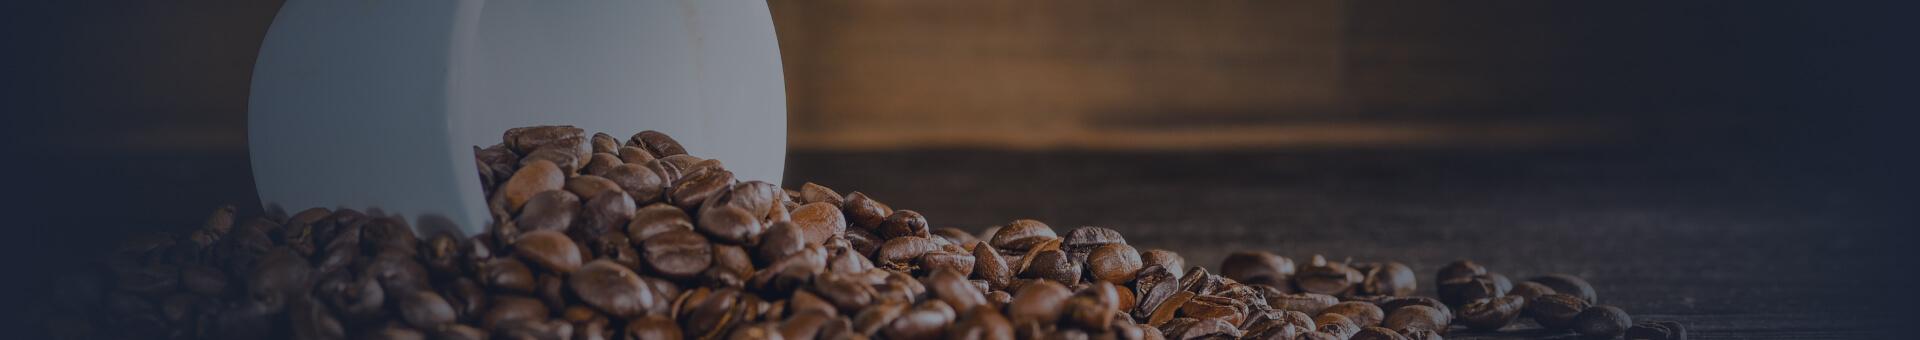 Caffeine Free Day